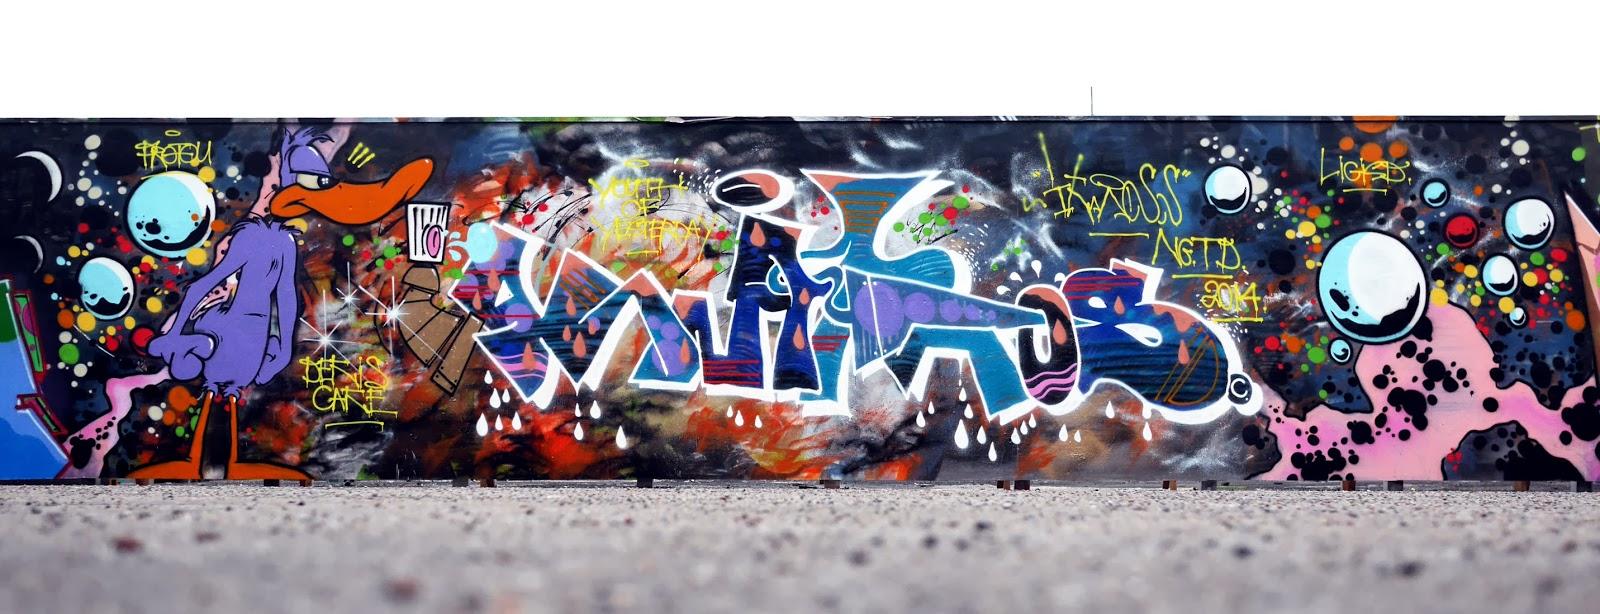 SprayDaily_Graffiti_Ikaros_1